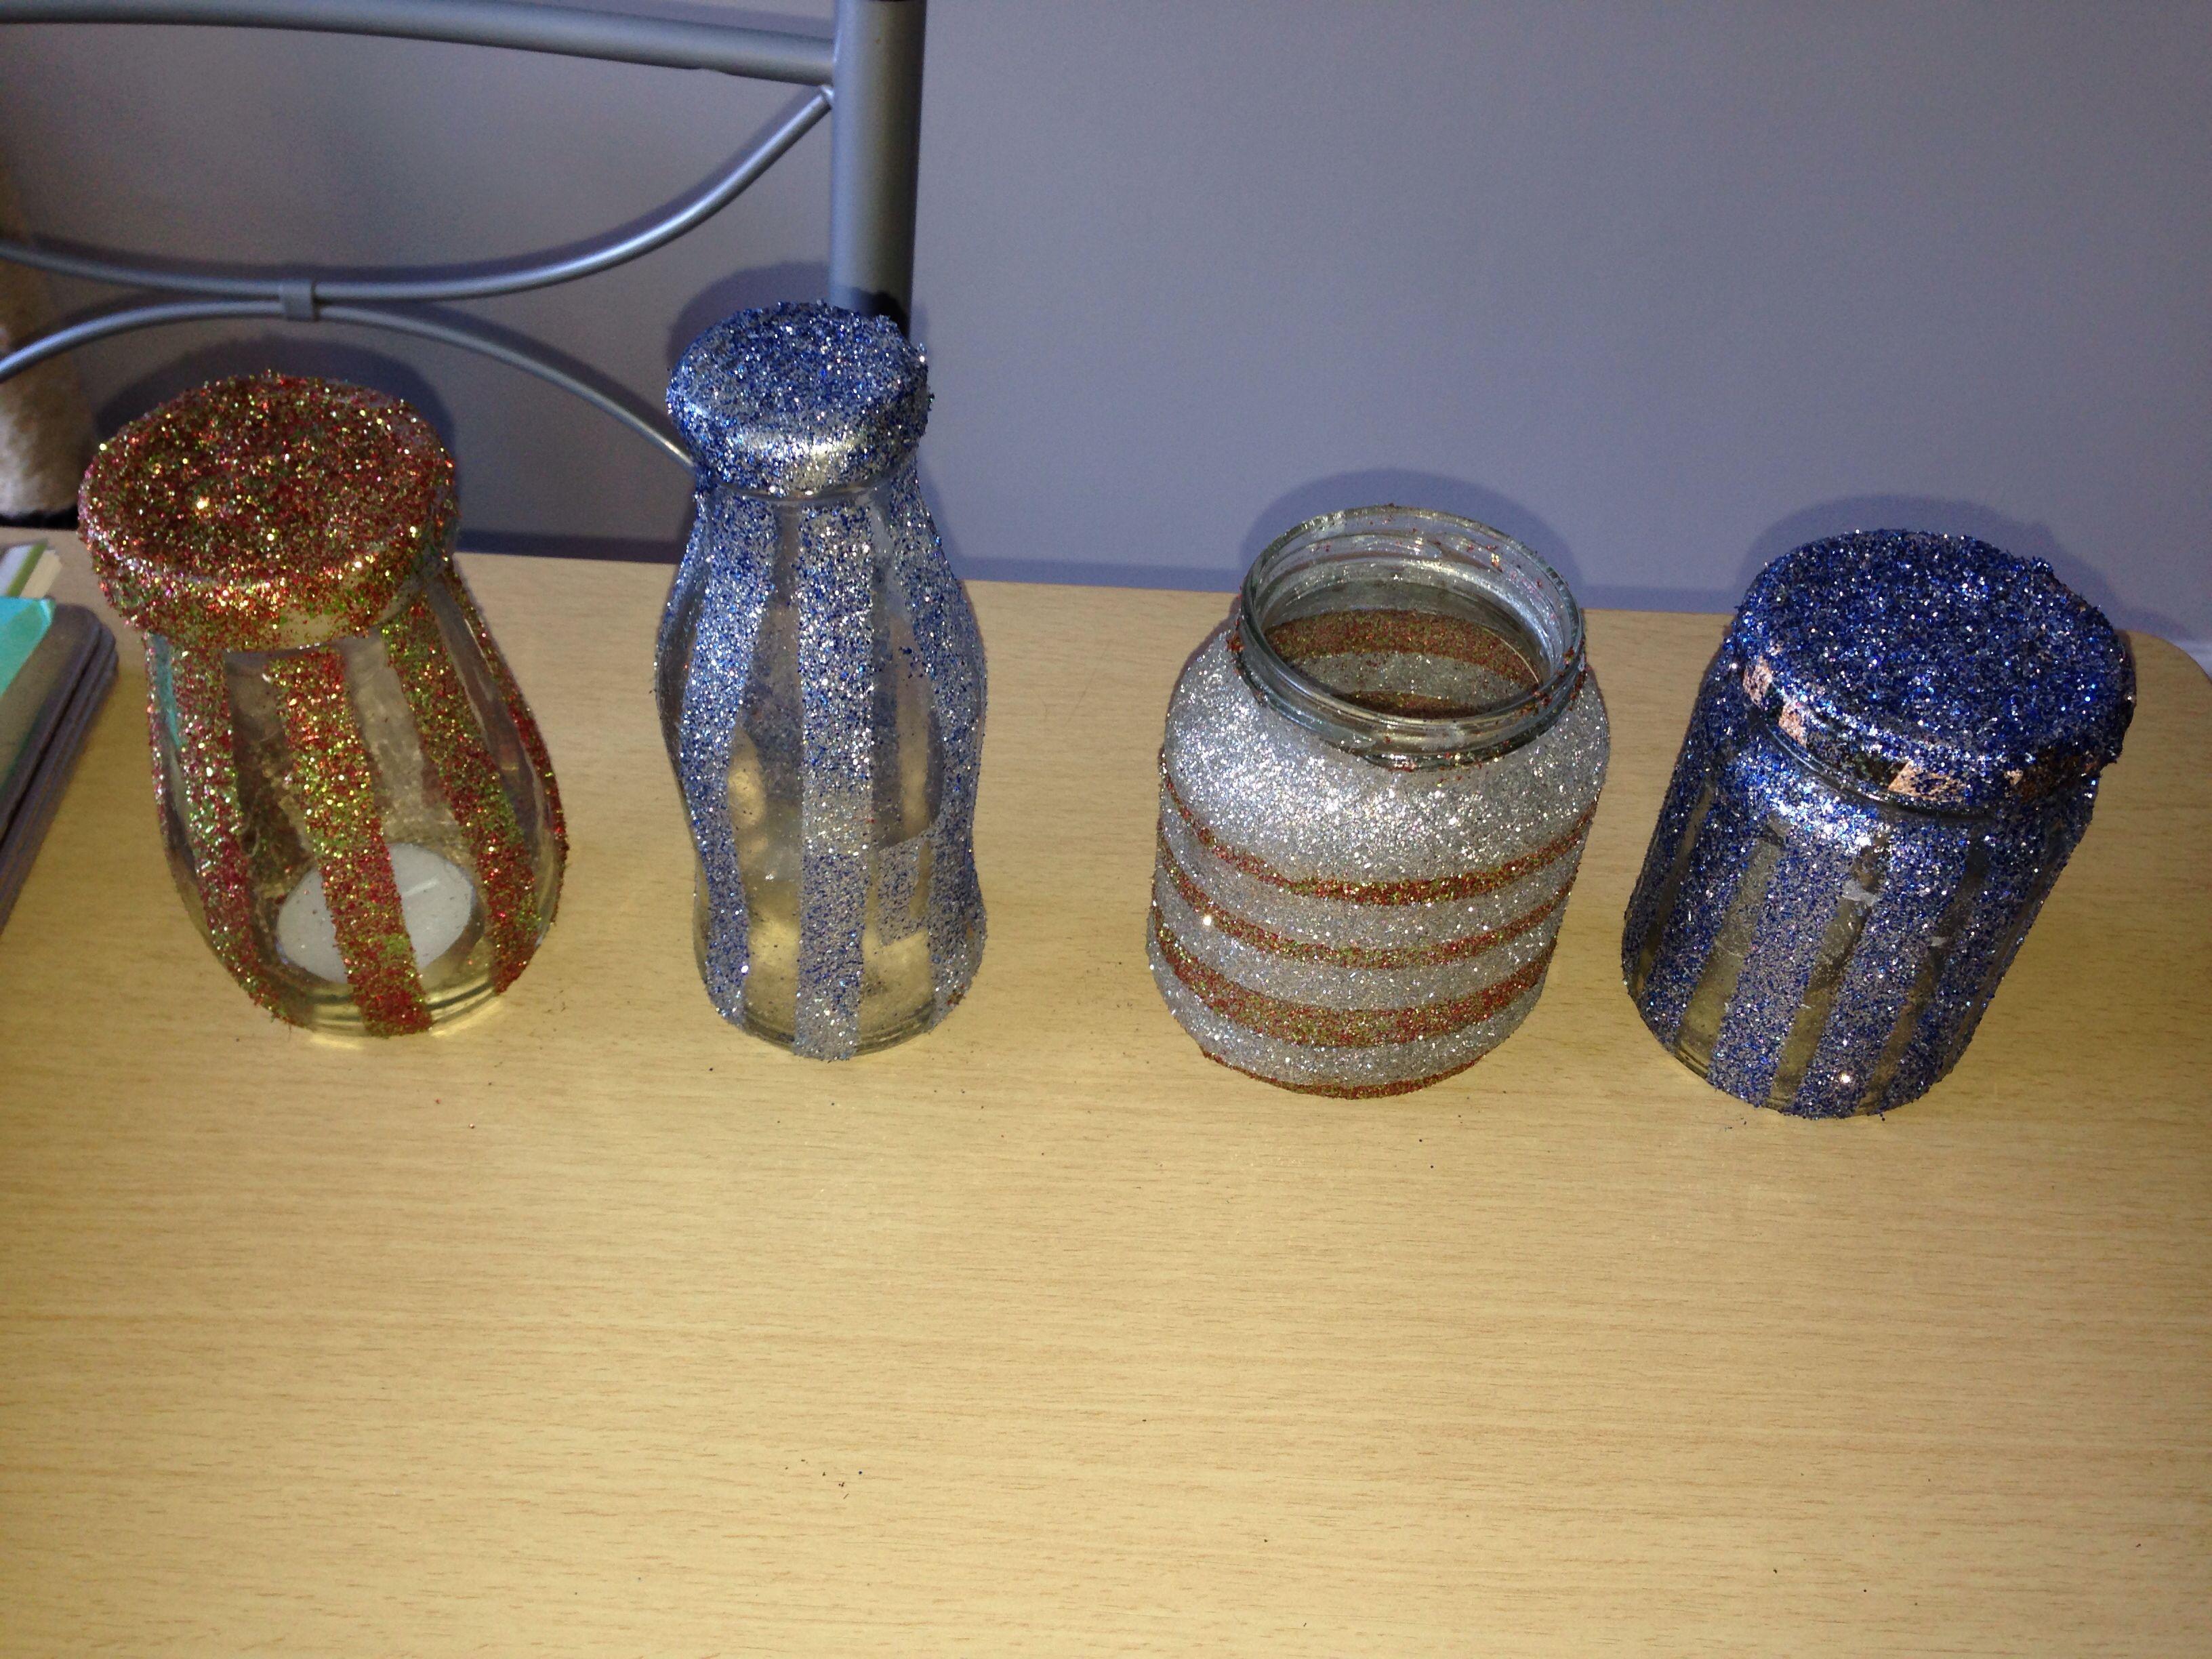 Glitter glass jars designed by me